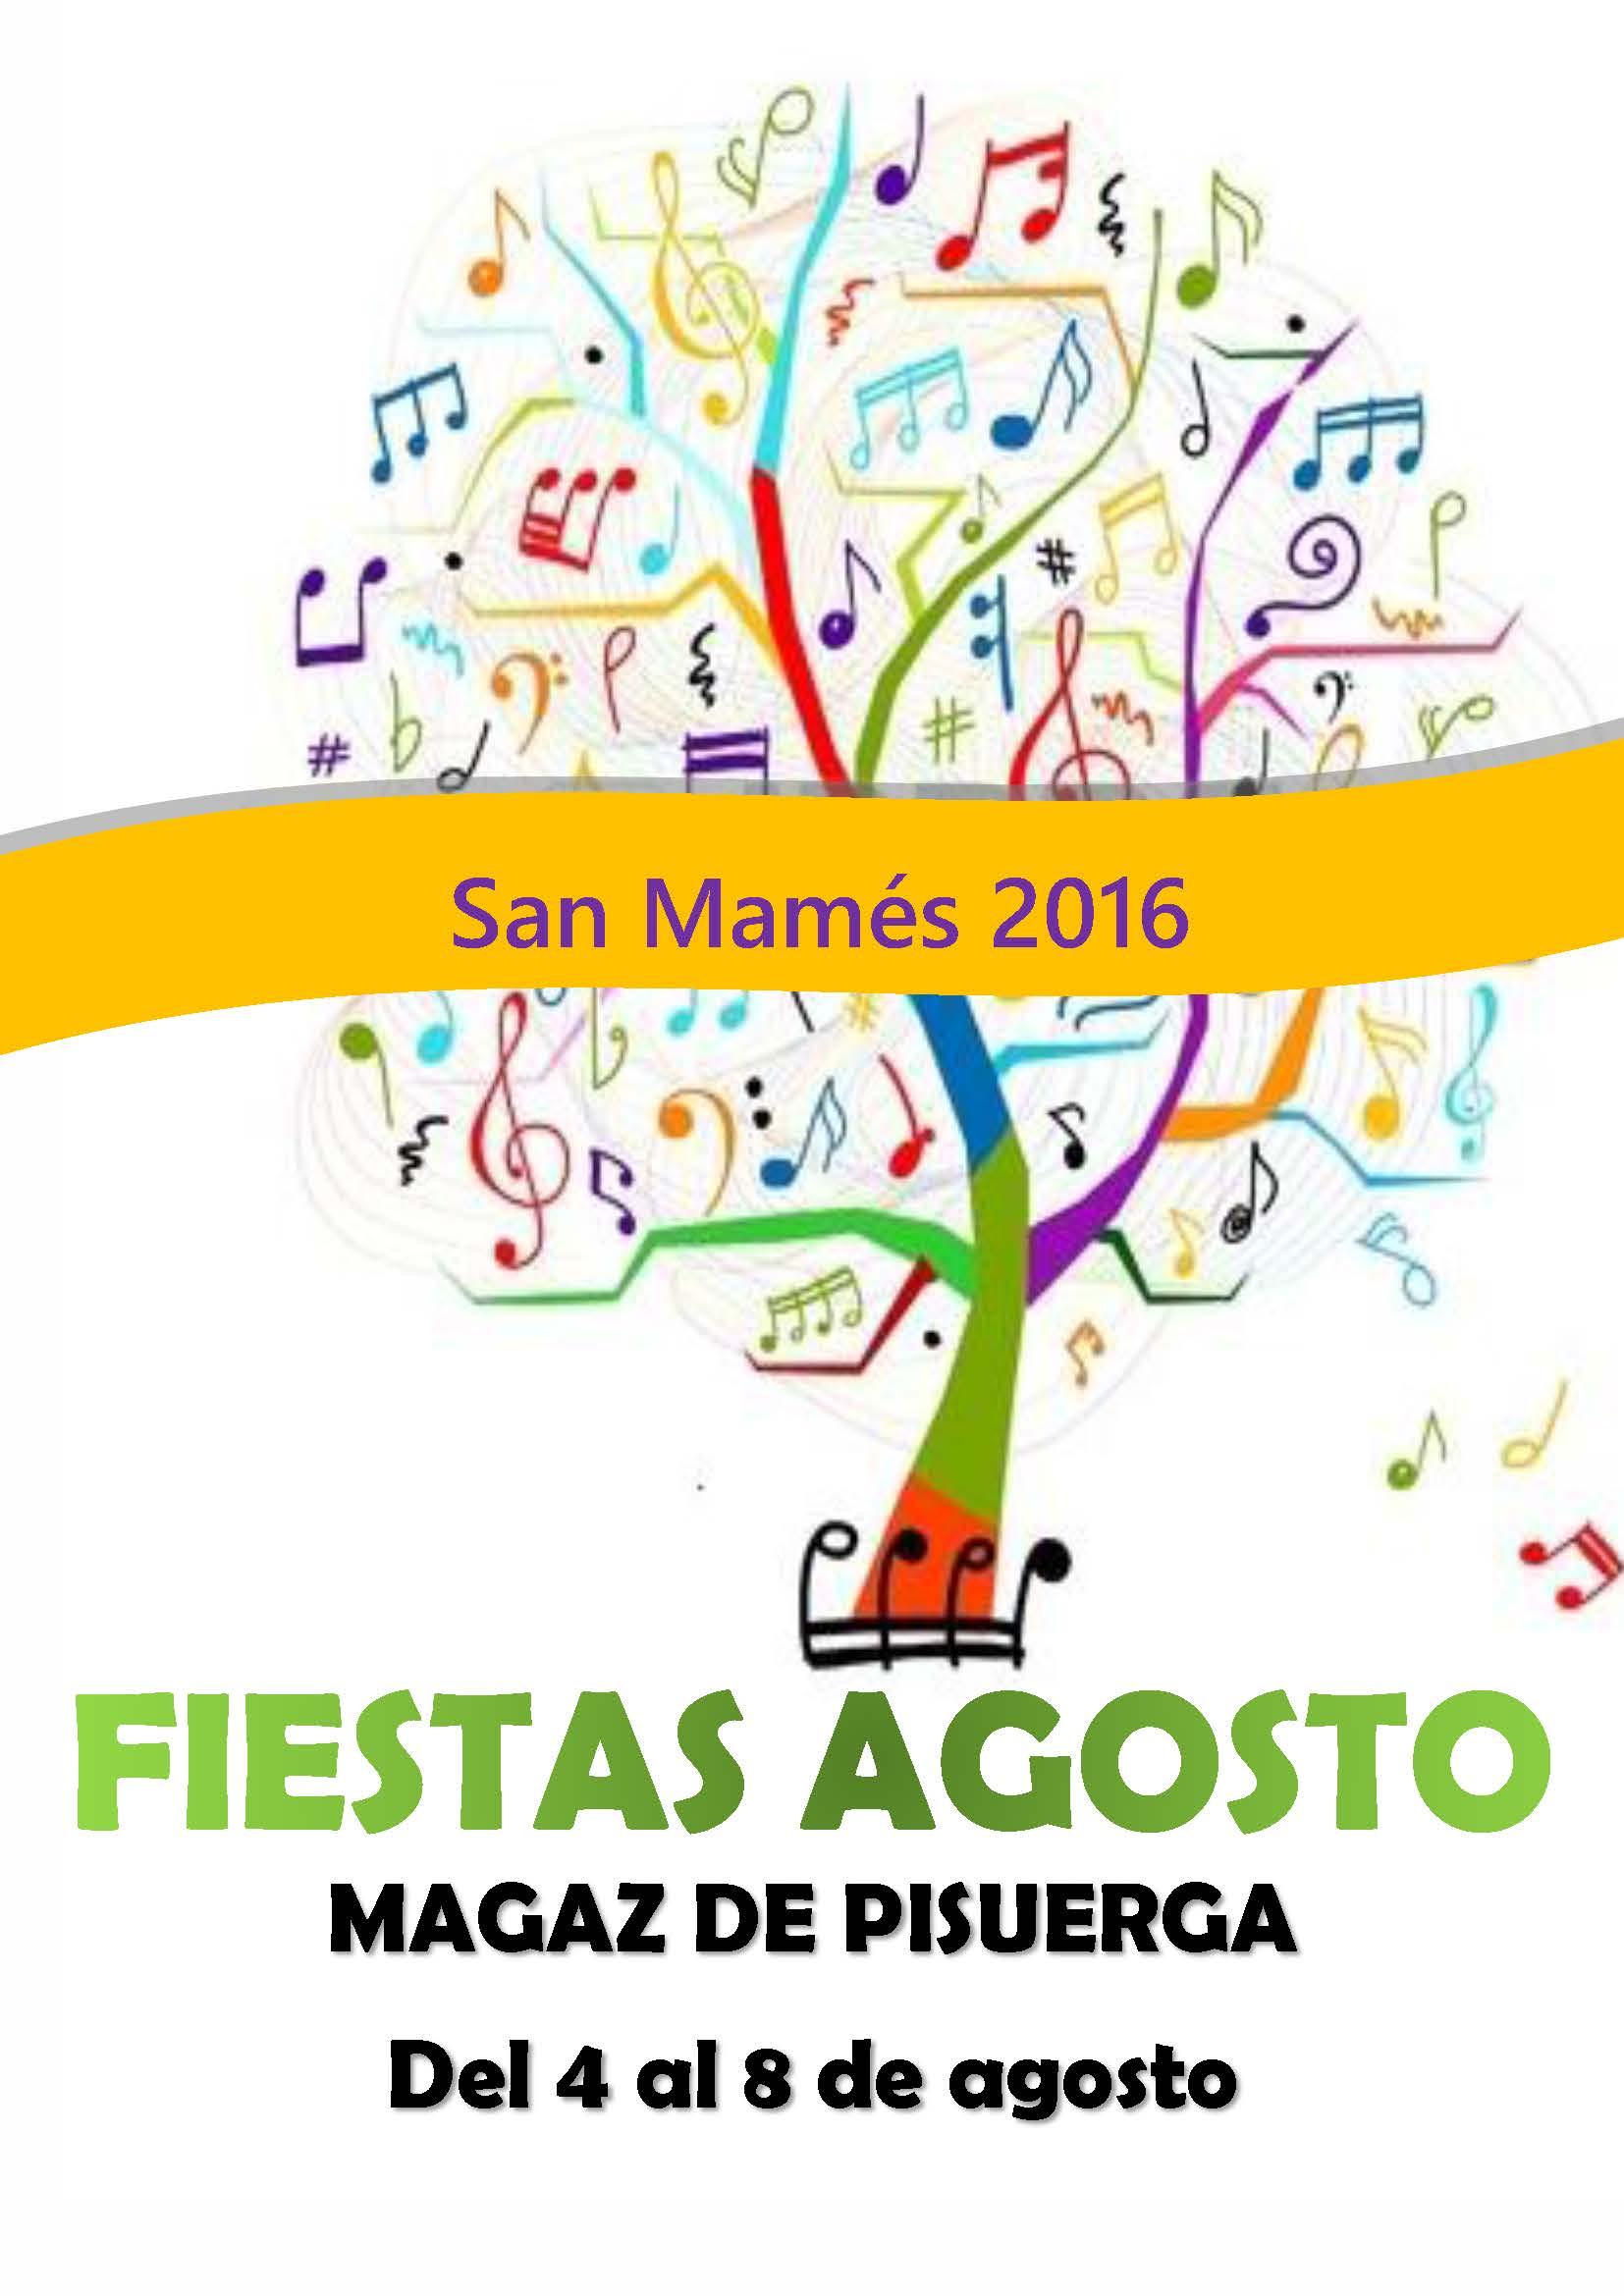 Programación de las fiestas «San Mamés 2016»